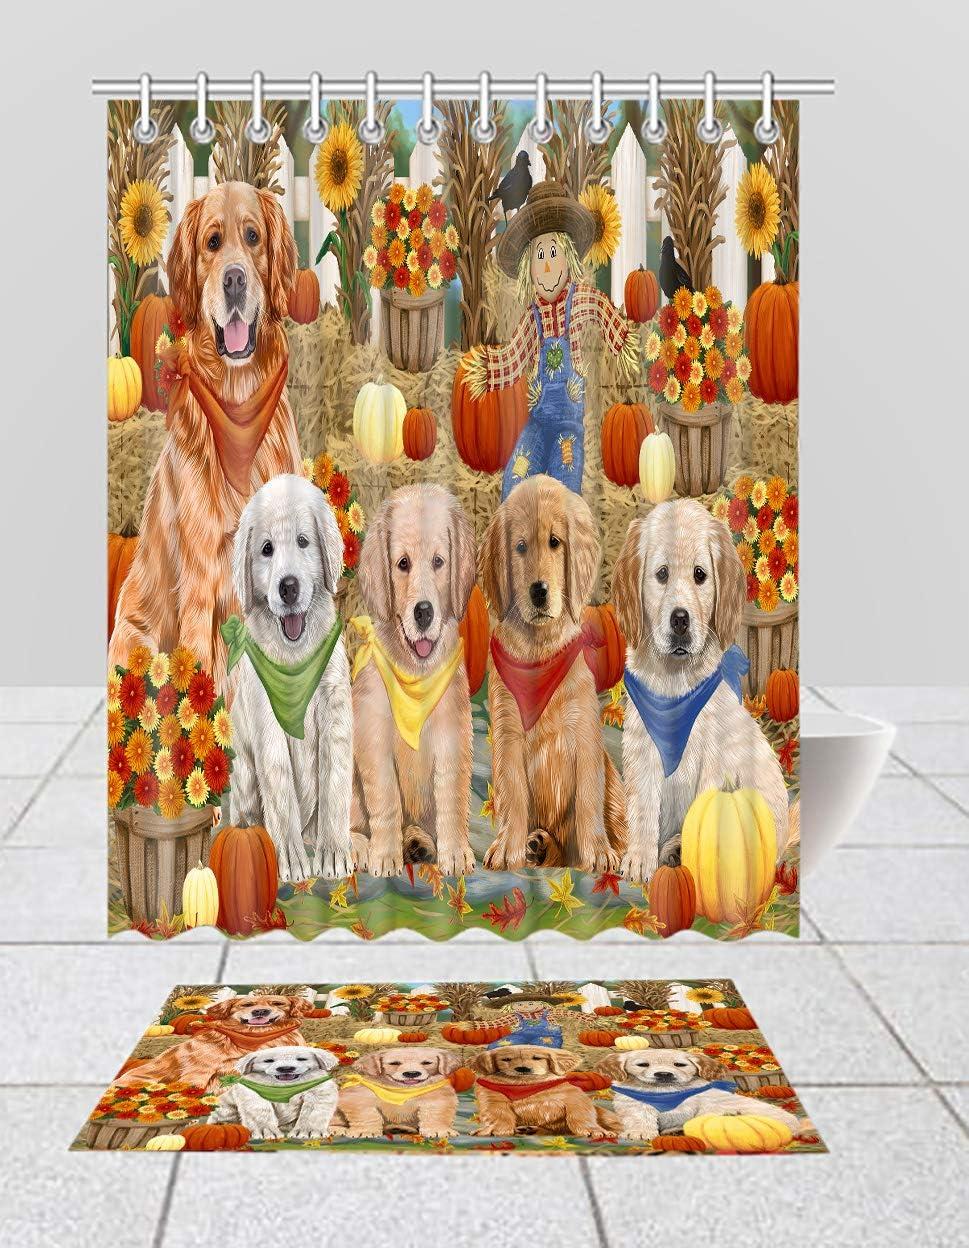 Fall security Festive Harvest Cheap Time Gathering Dogs Golden Shower Retriever